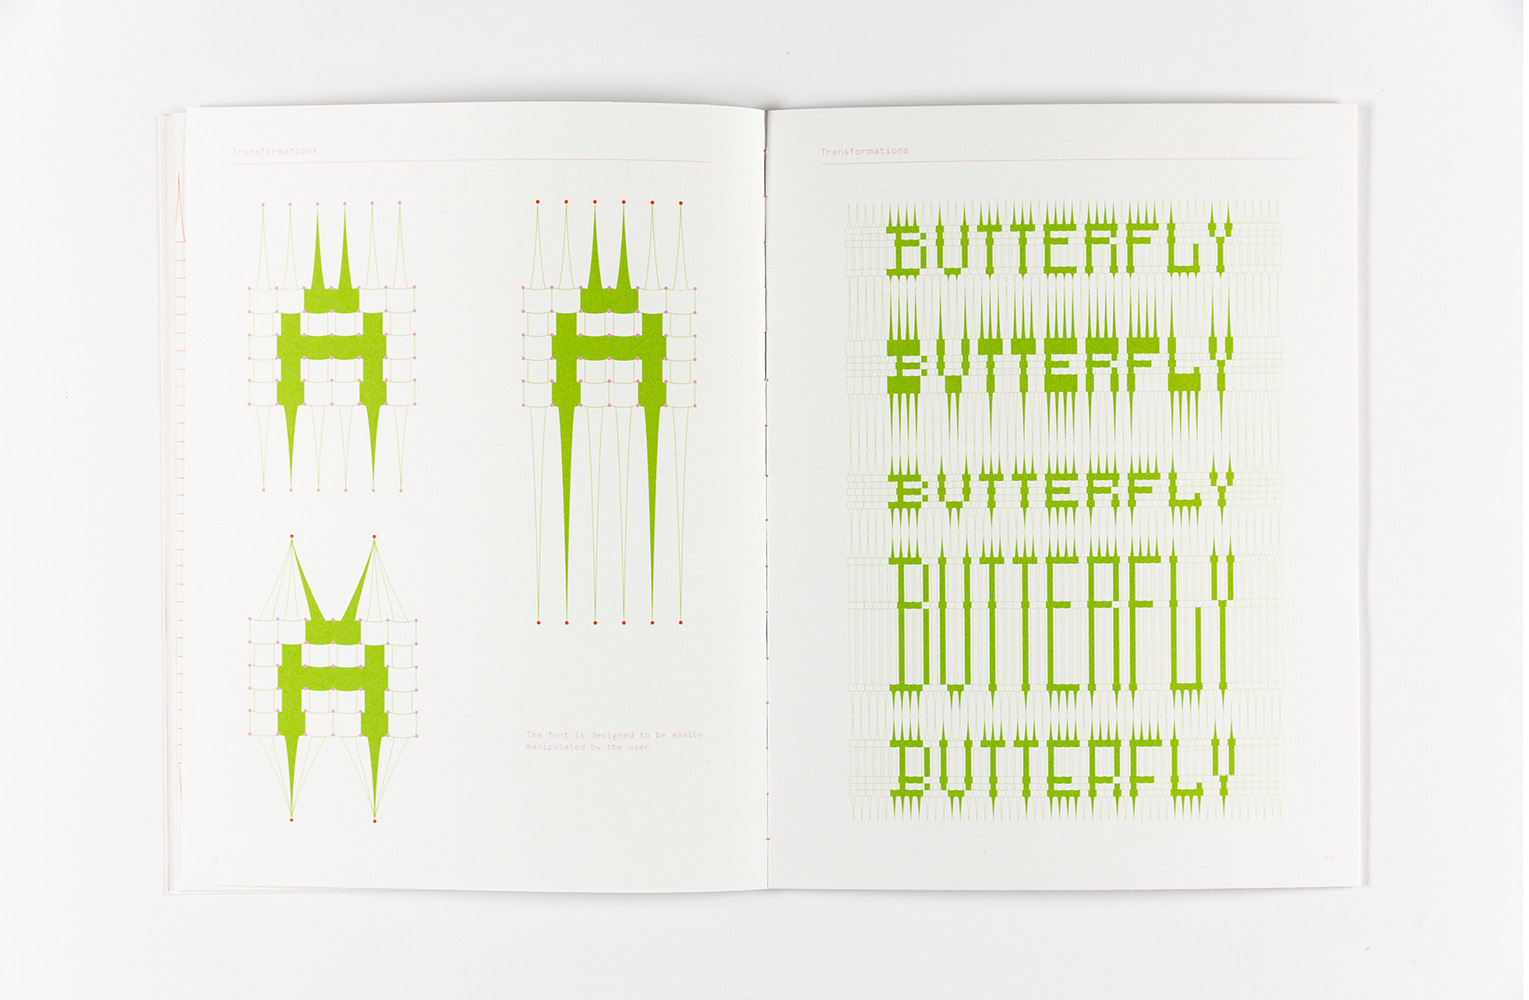 Display fonts